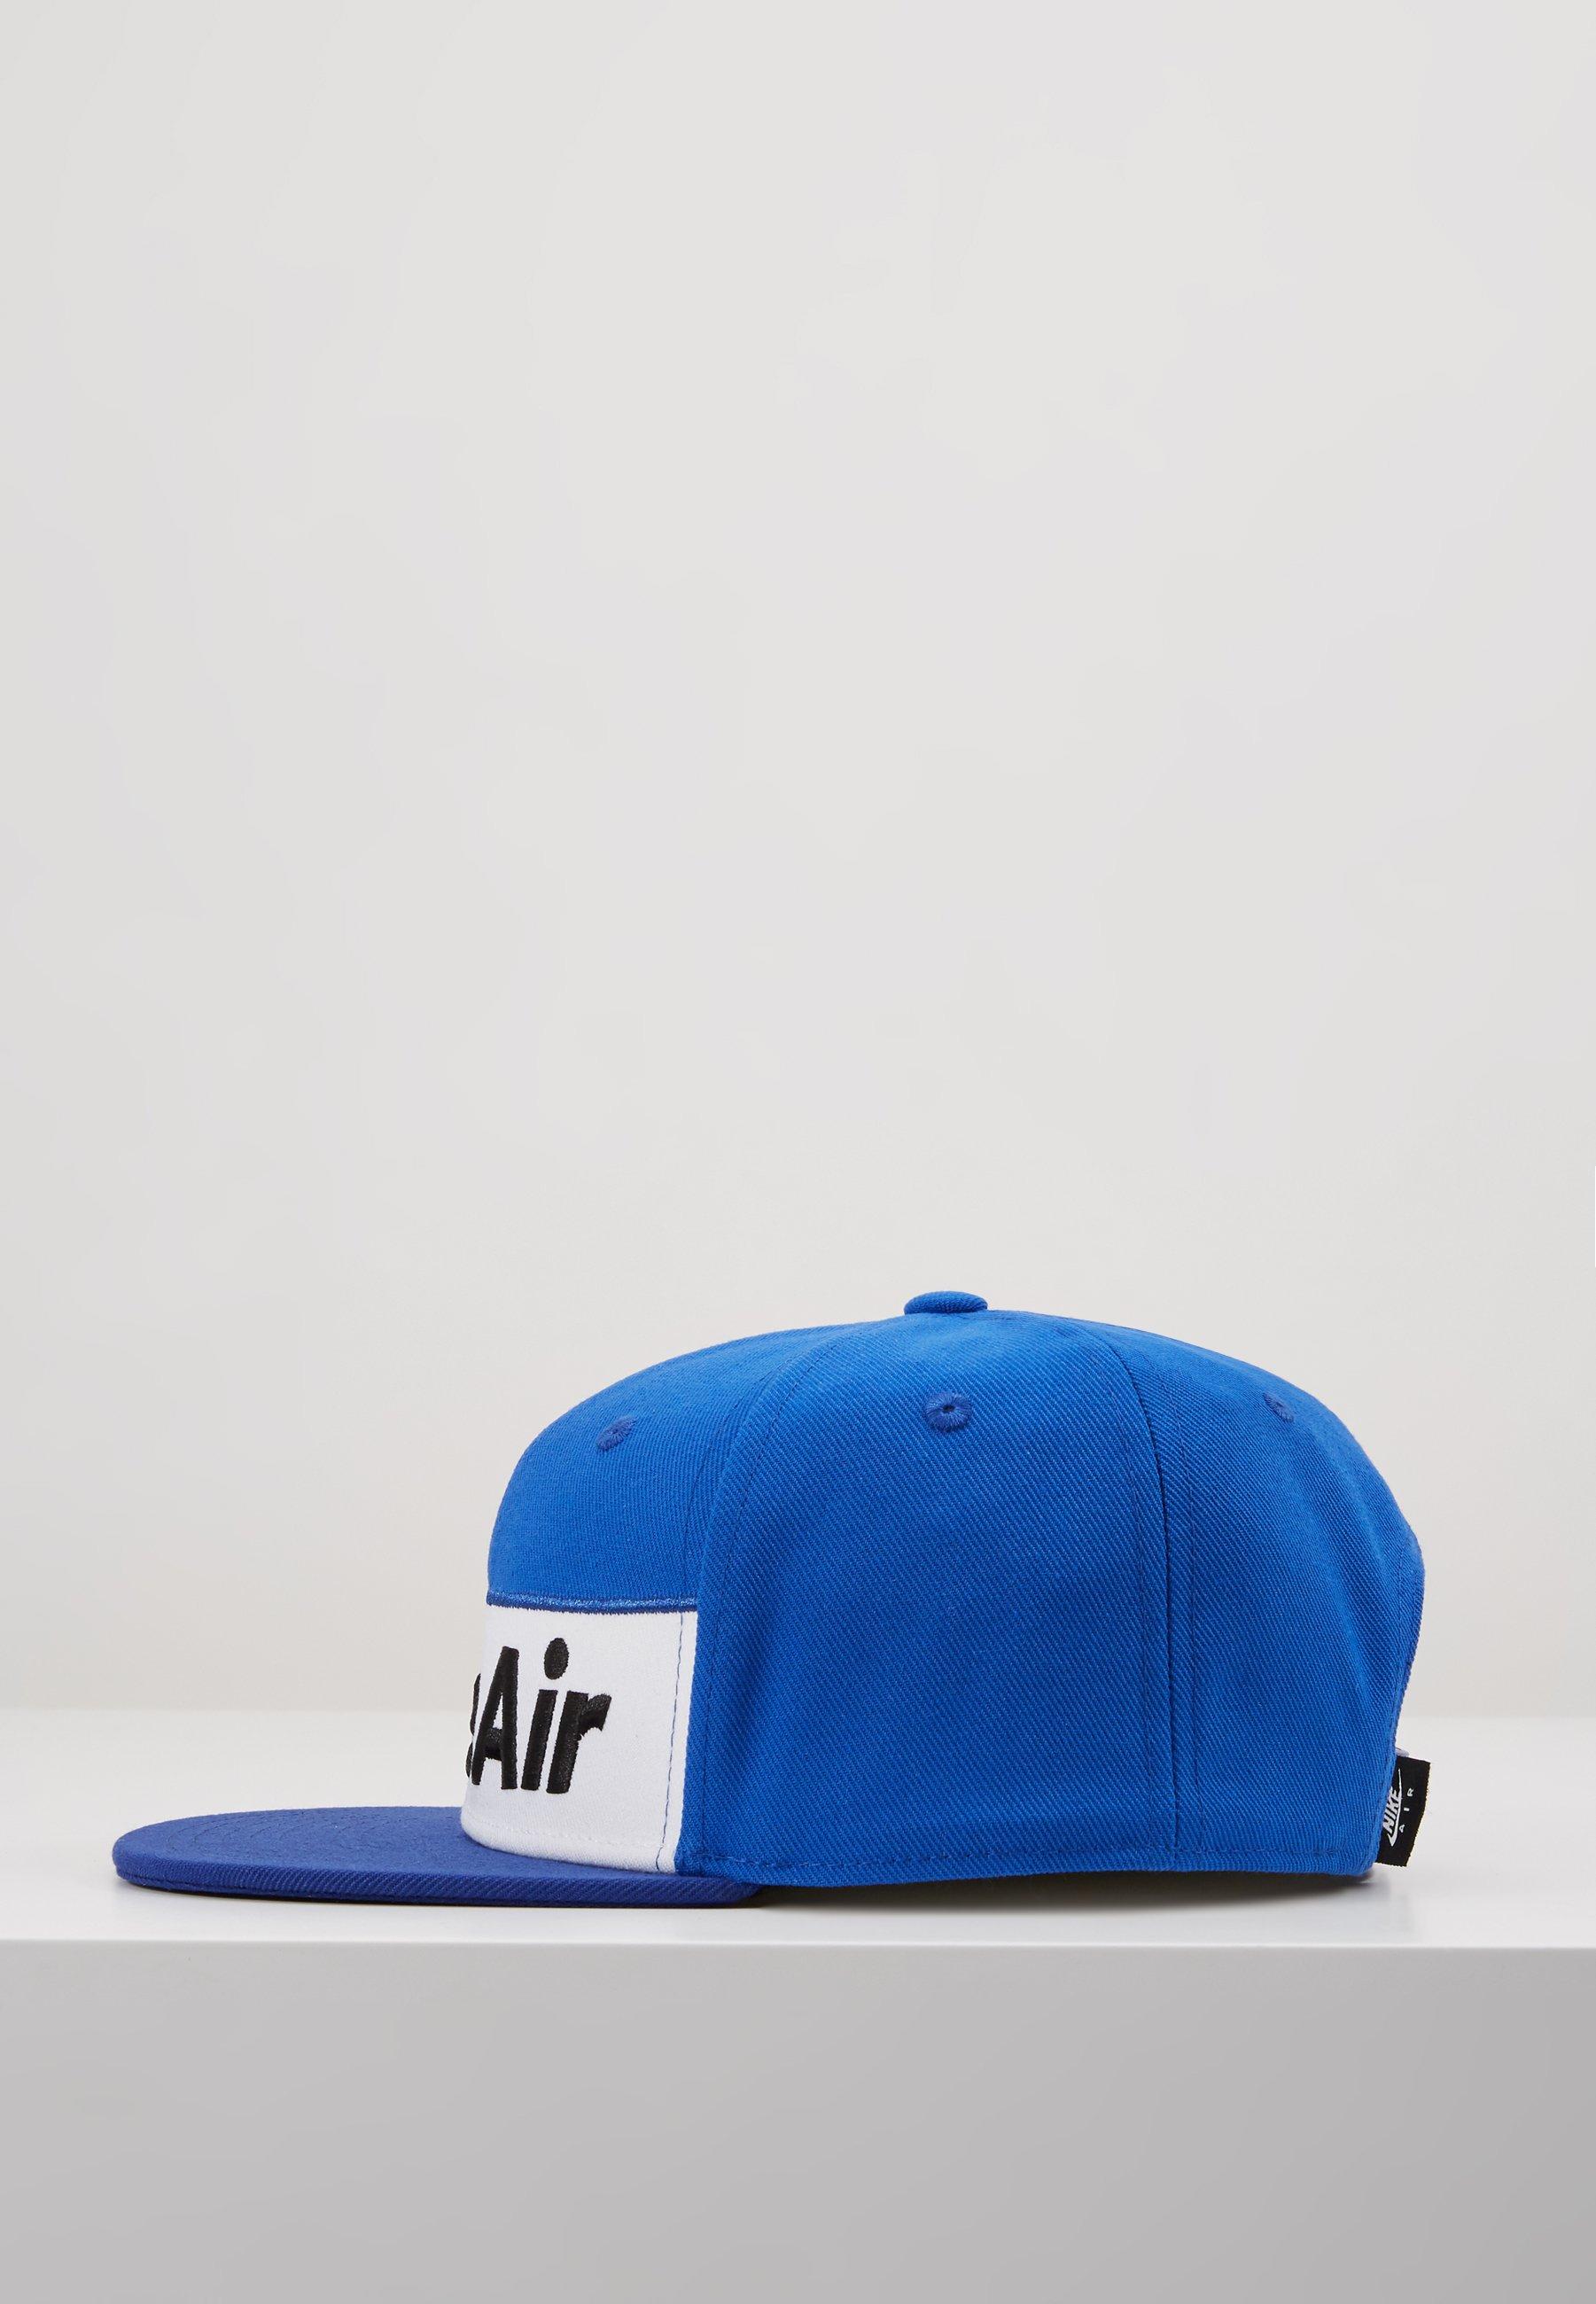 Nike Sportswear NSW NIKE AIR FLAT BRIM - Cap - game royal/blå 6jtetGHHoSG91Th